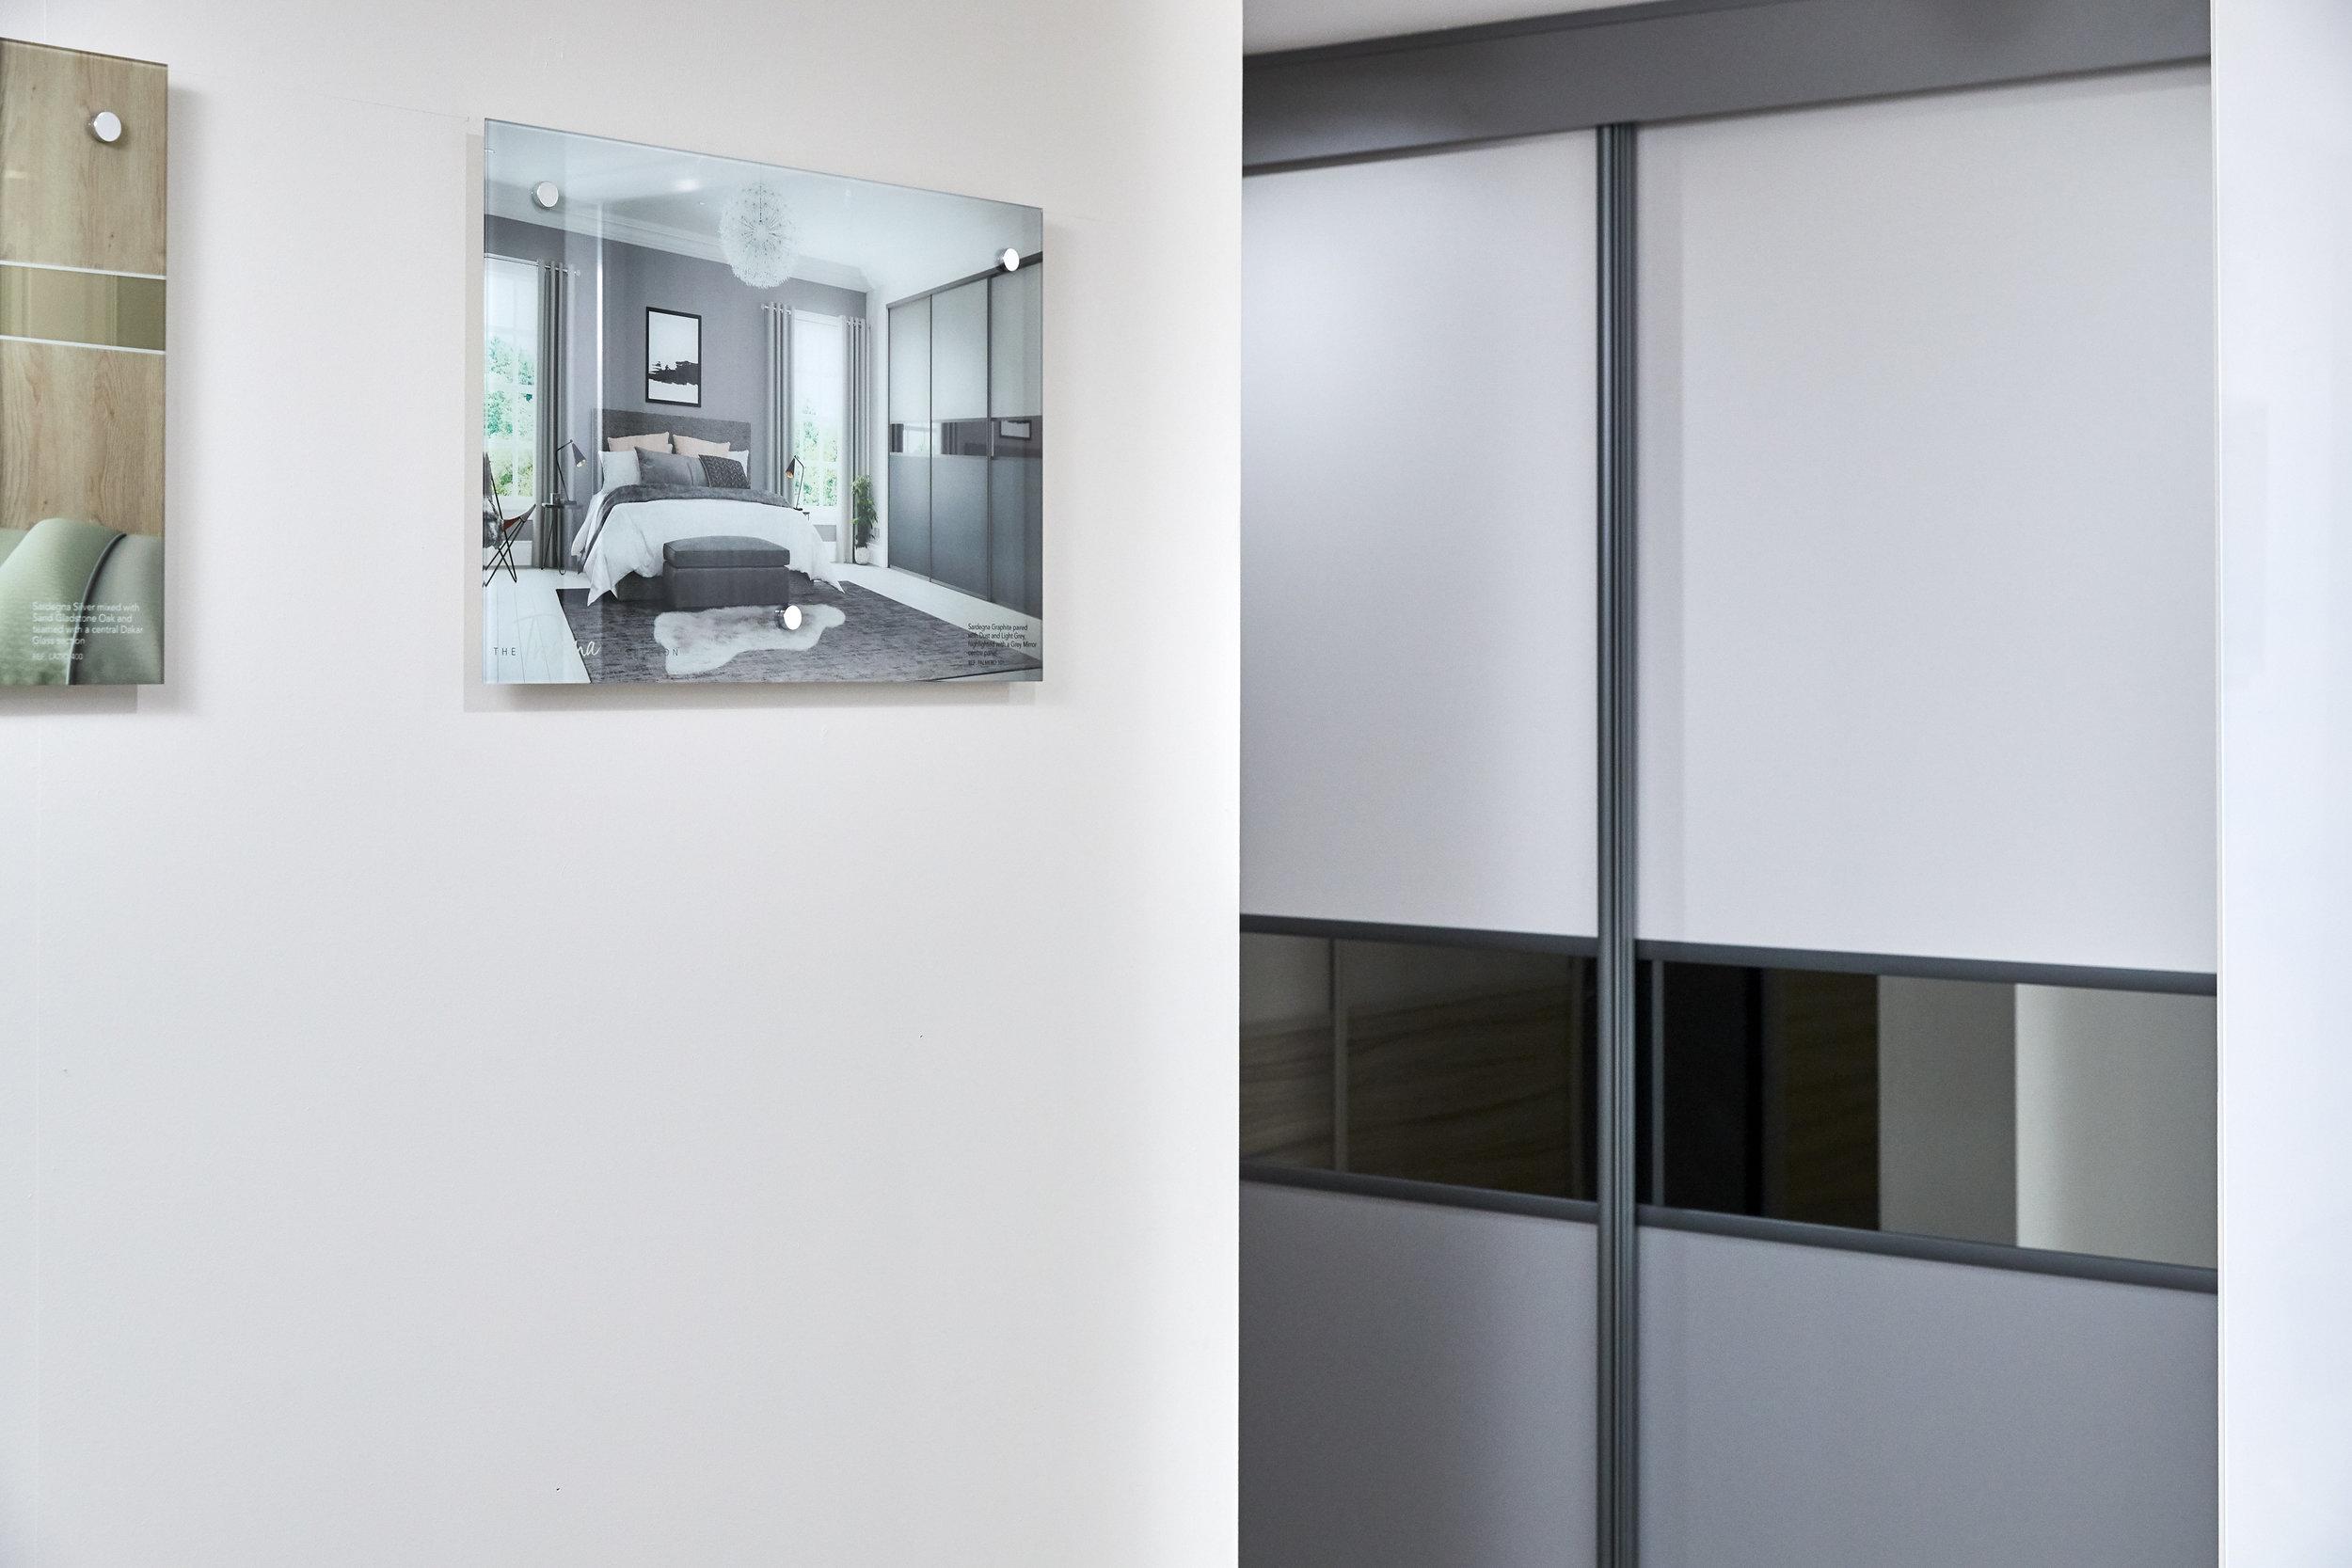 2019_01_17_Global_Doors_Showrooms_0122.jpg